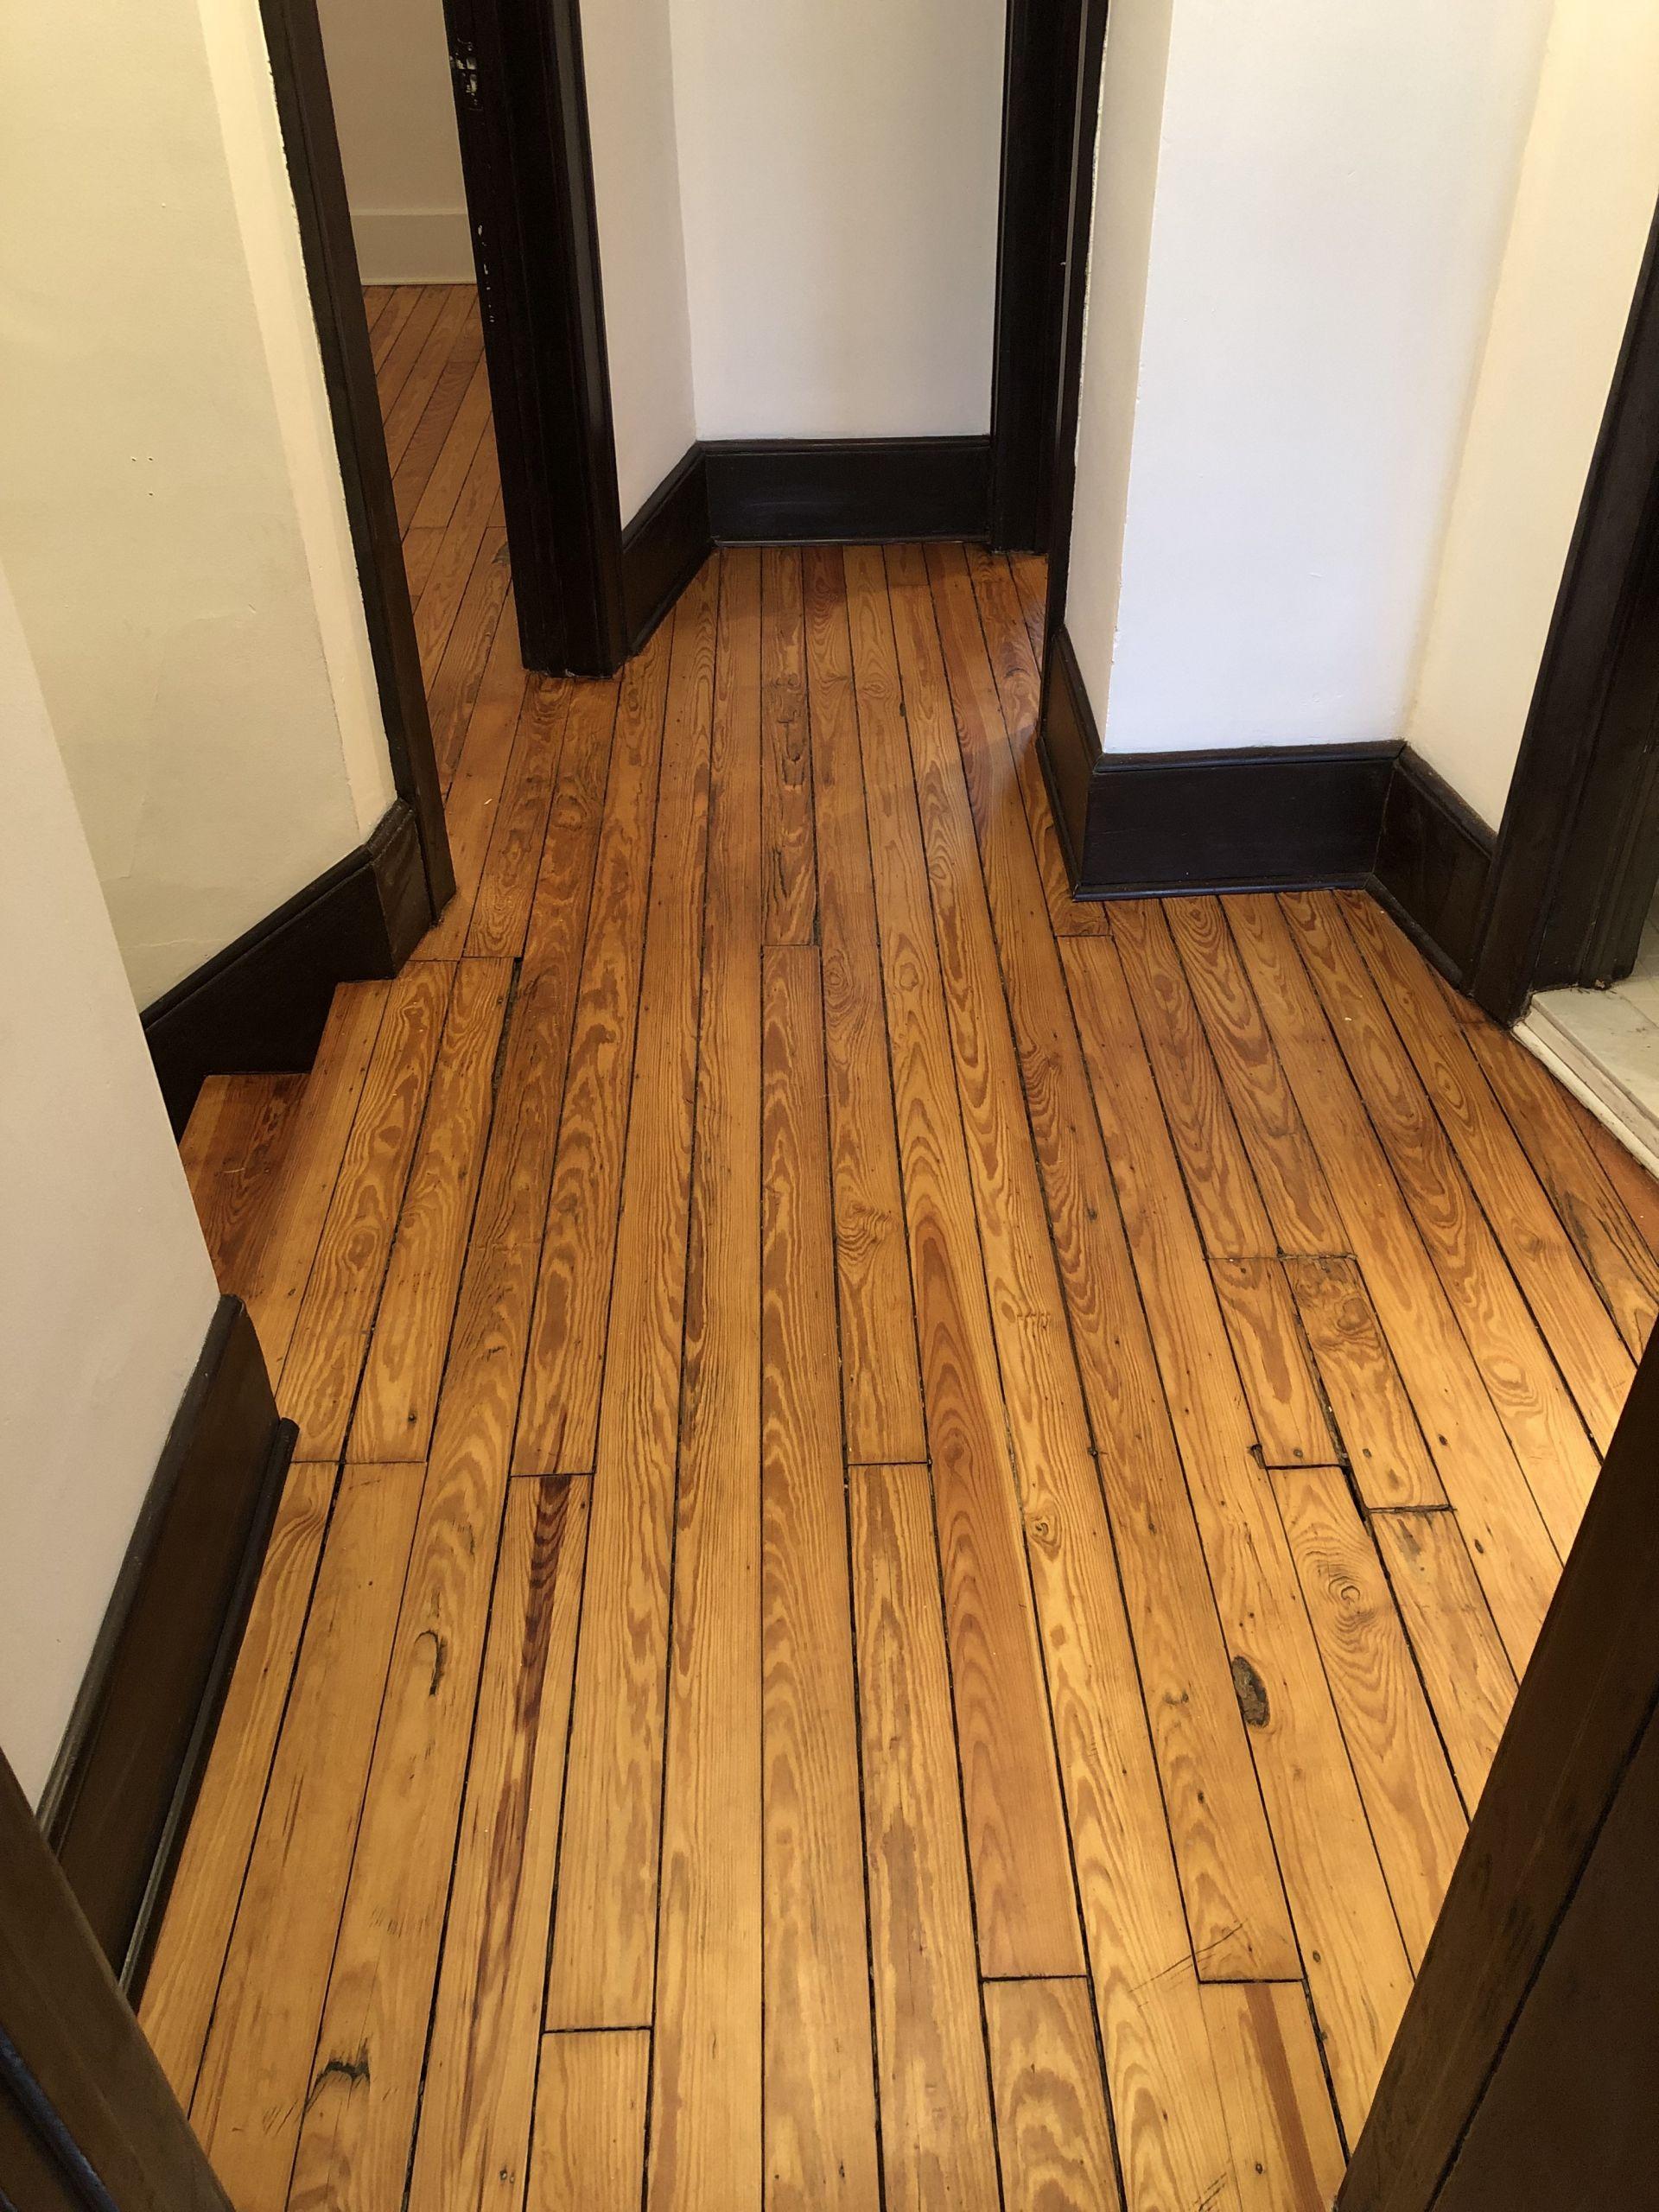 DIY Sanding Hardwood Floors  HOW TO REFINISH HARDWOOD FLOORS Step by Step Do It